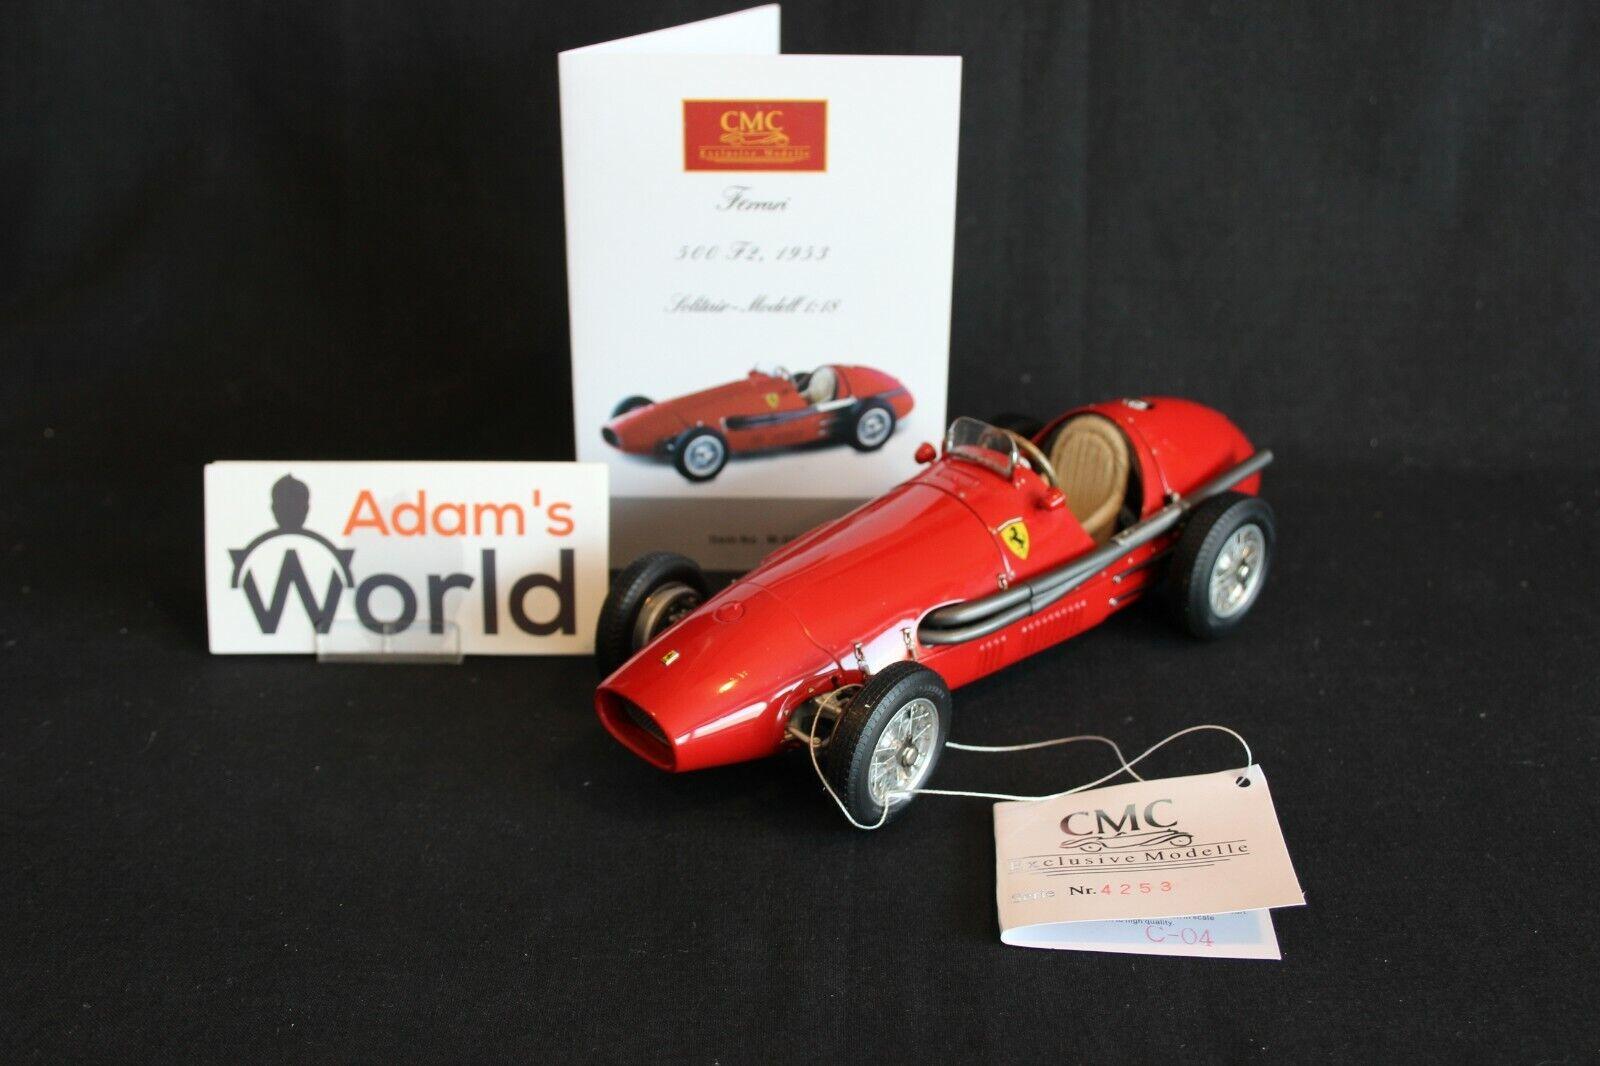 CMC Ferrari 500 F2 1953 1 18 rosso  Der Doppelweltmeister  (PJBB)